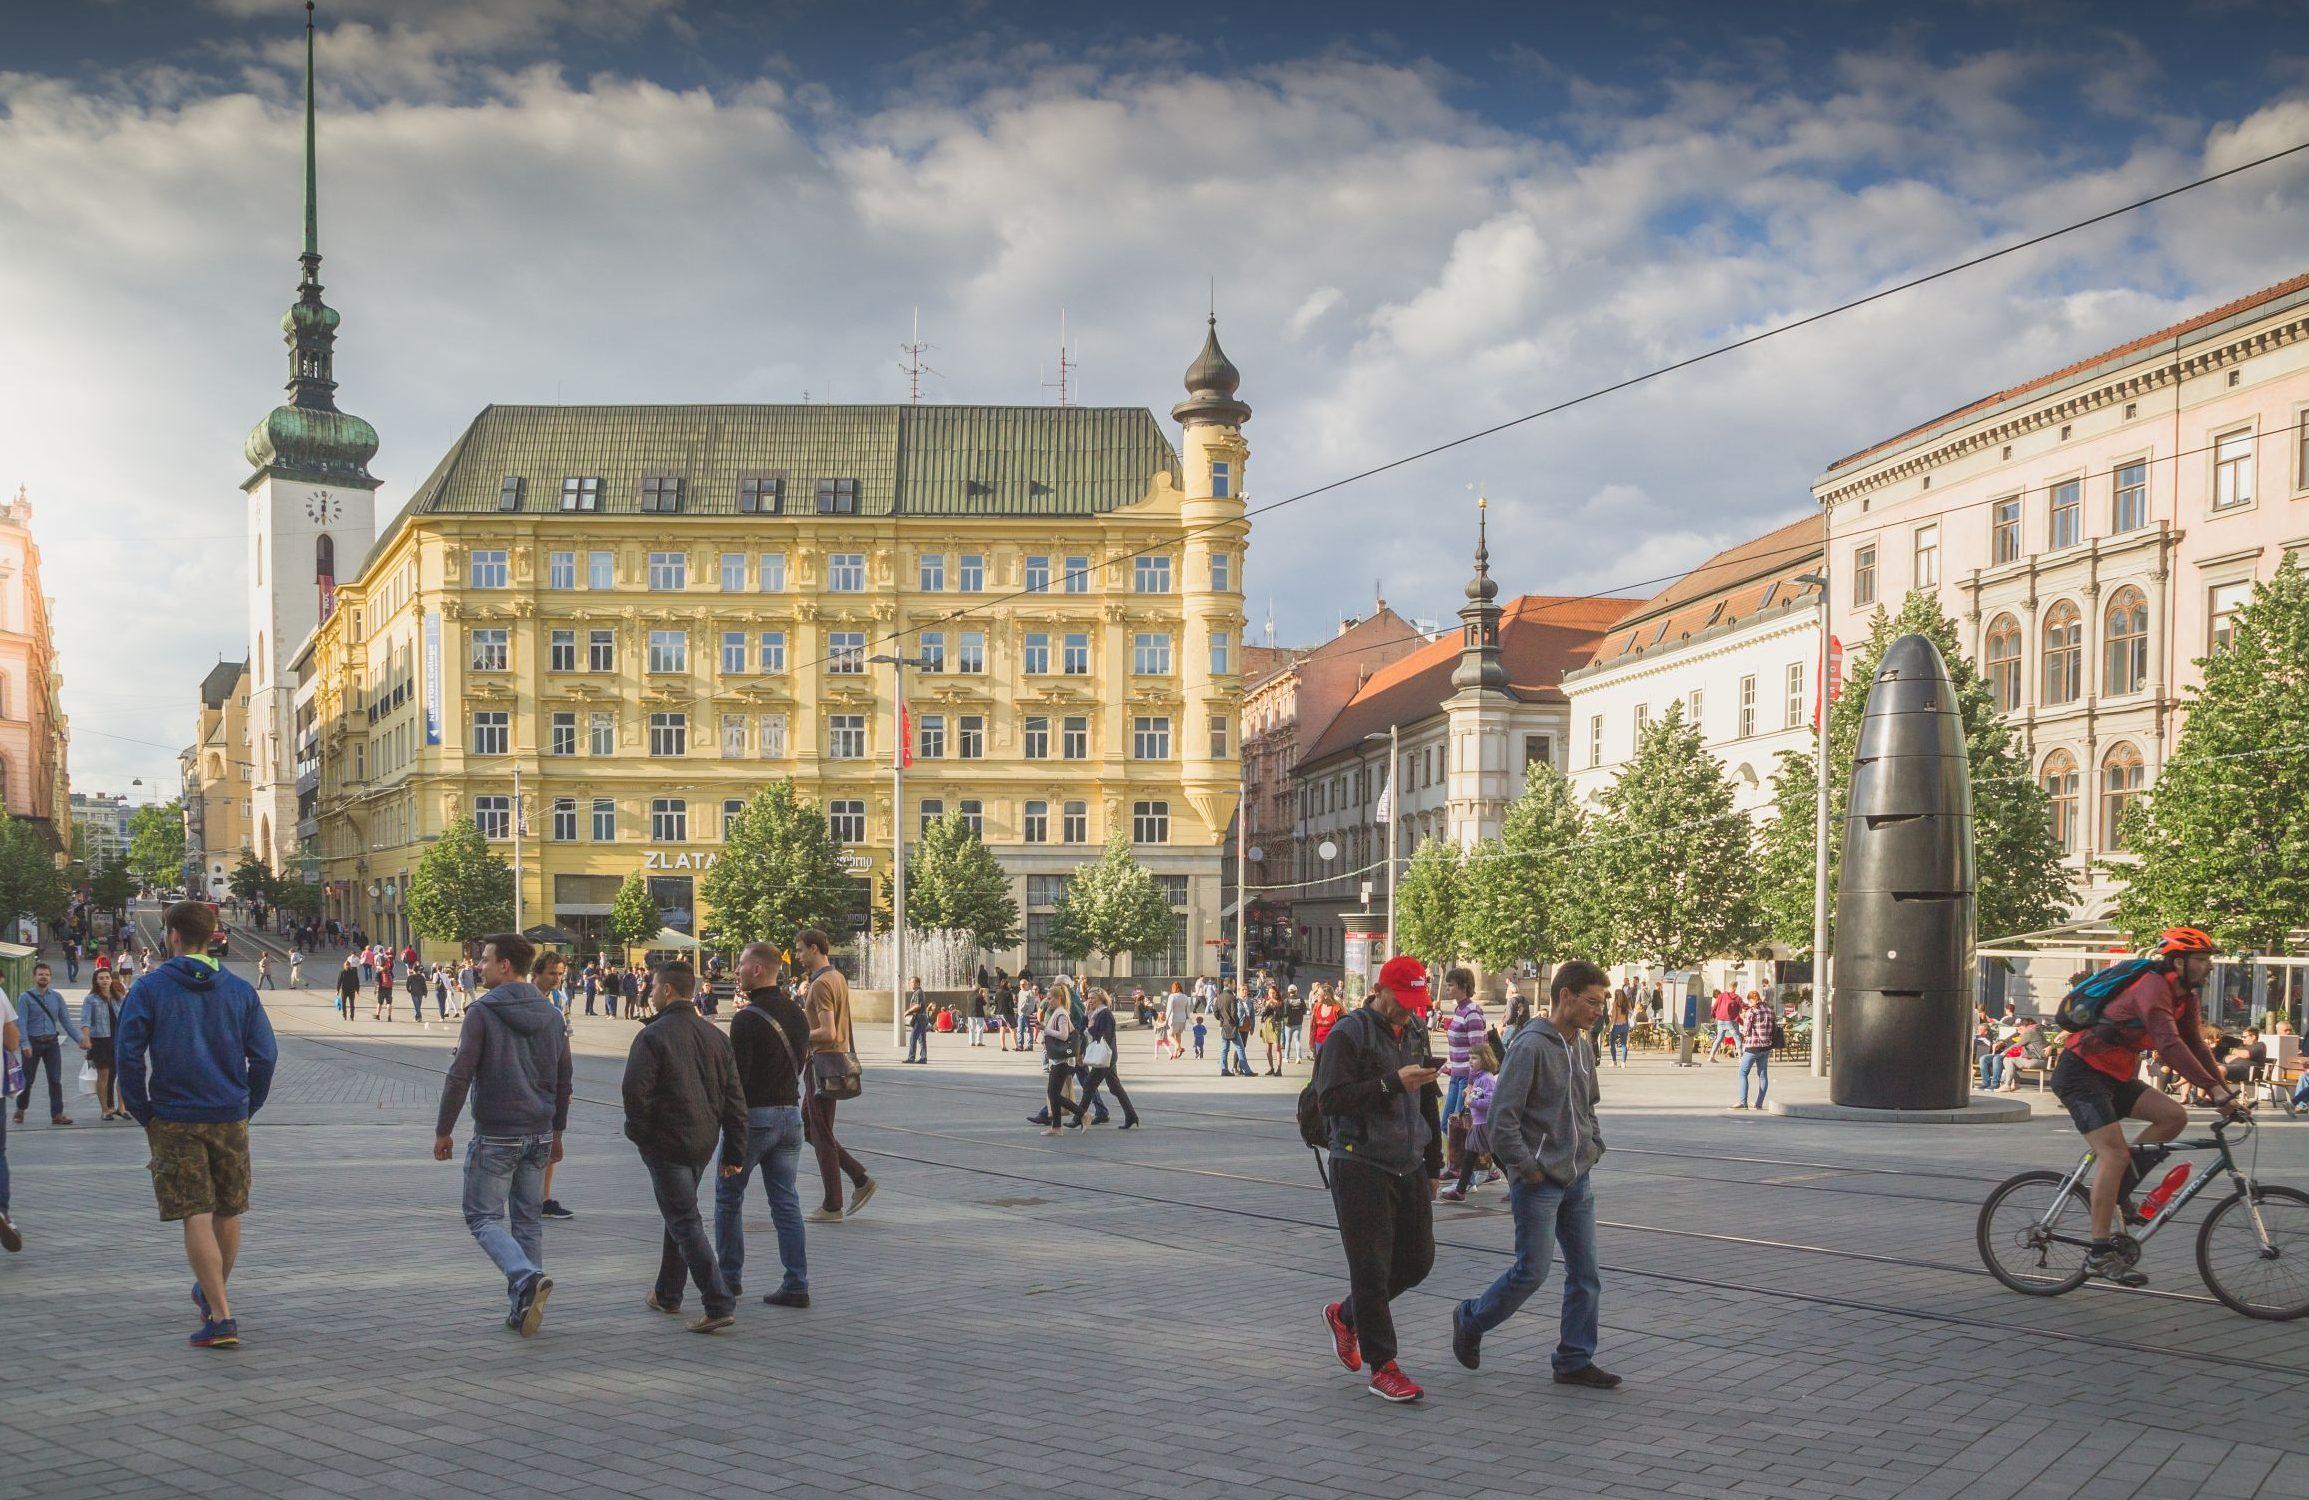 Freedom Square in Brno